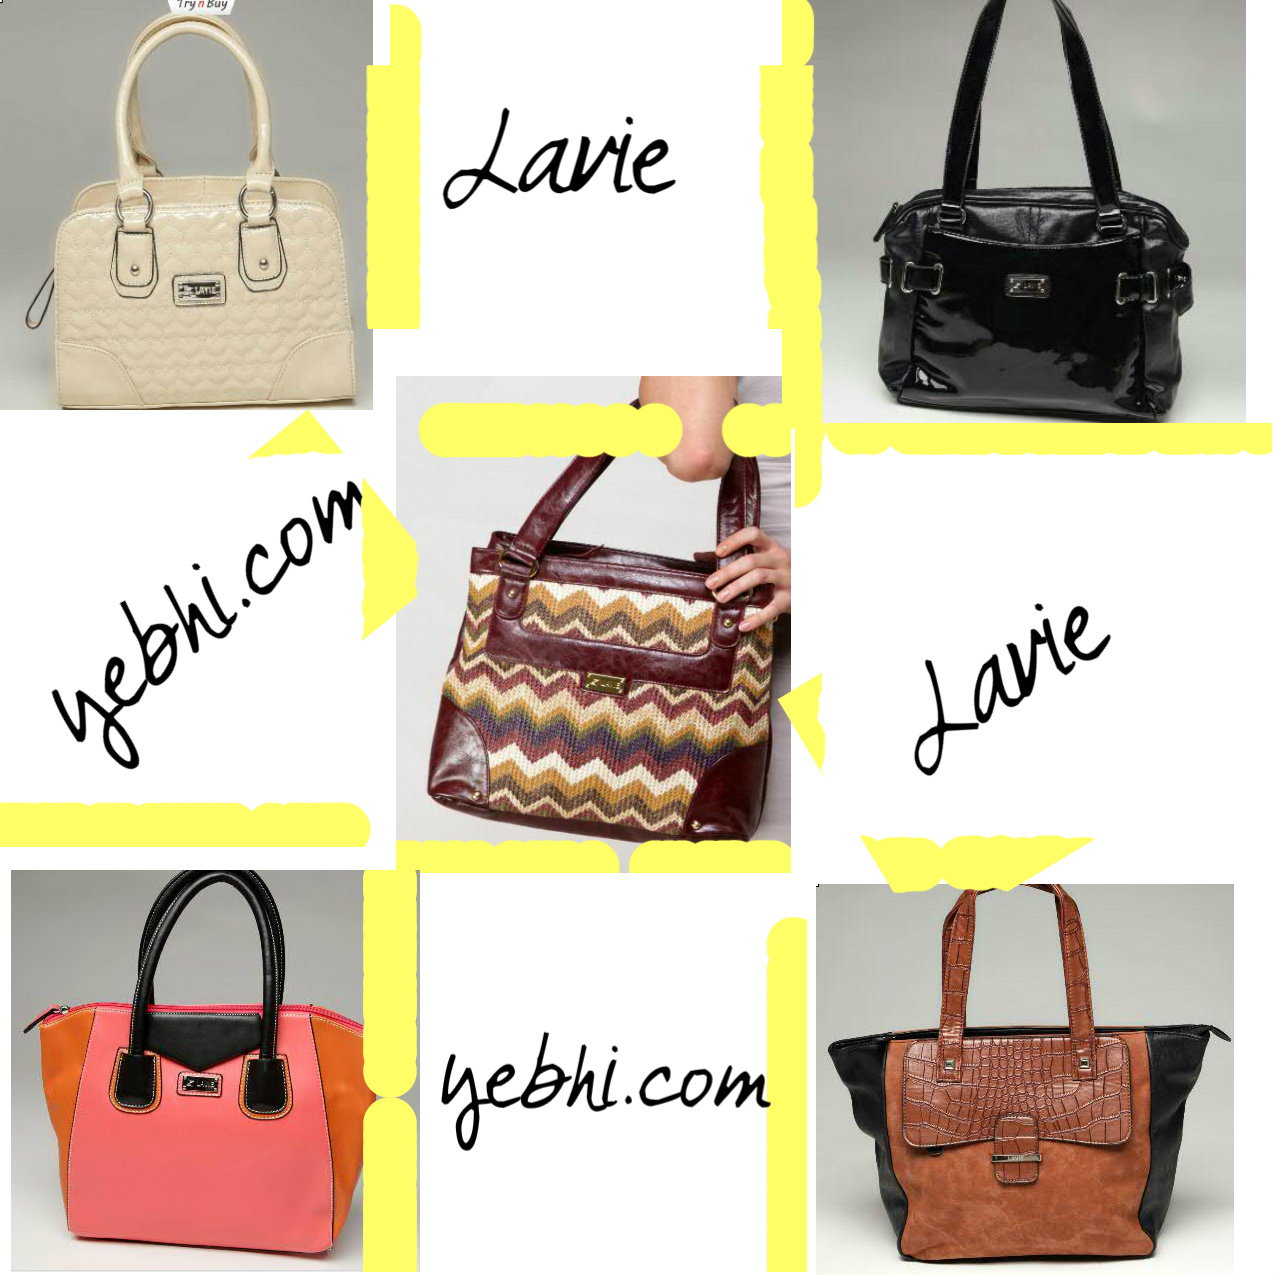 Shop for Lavie Handbags and Meet Kareena Kapoor - Shopping dc5f25c621890